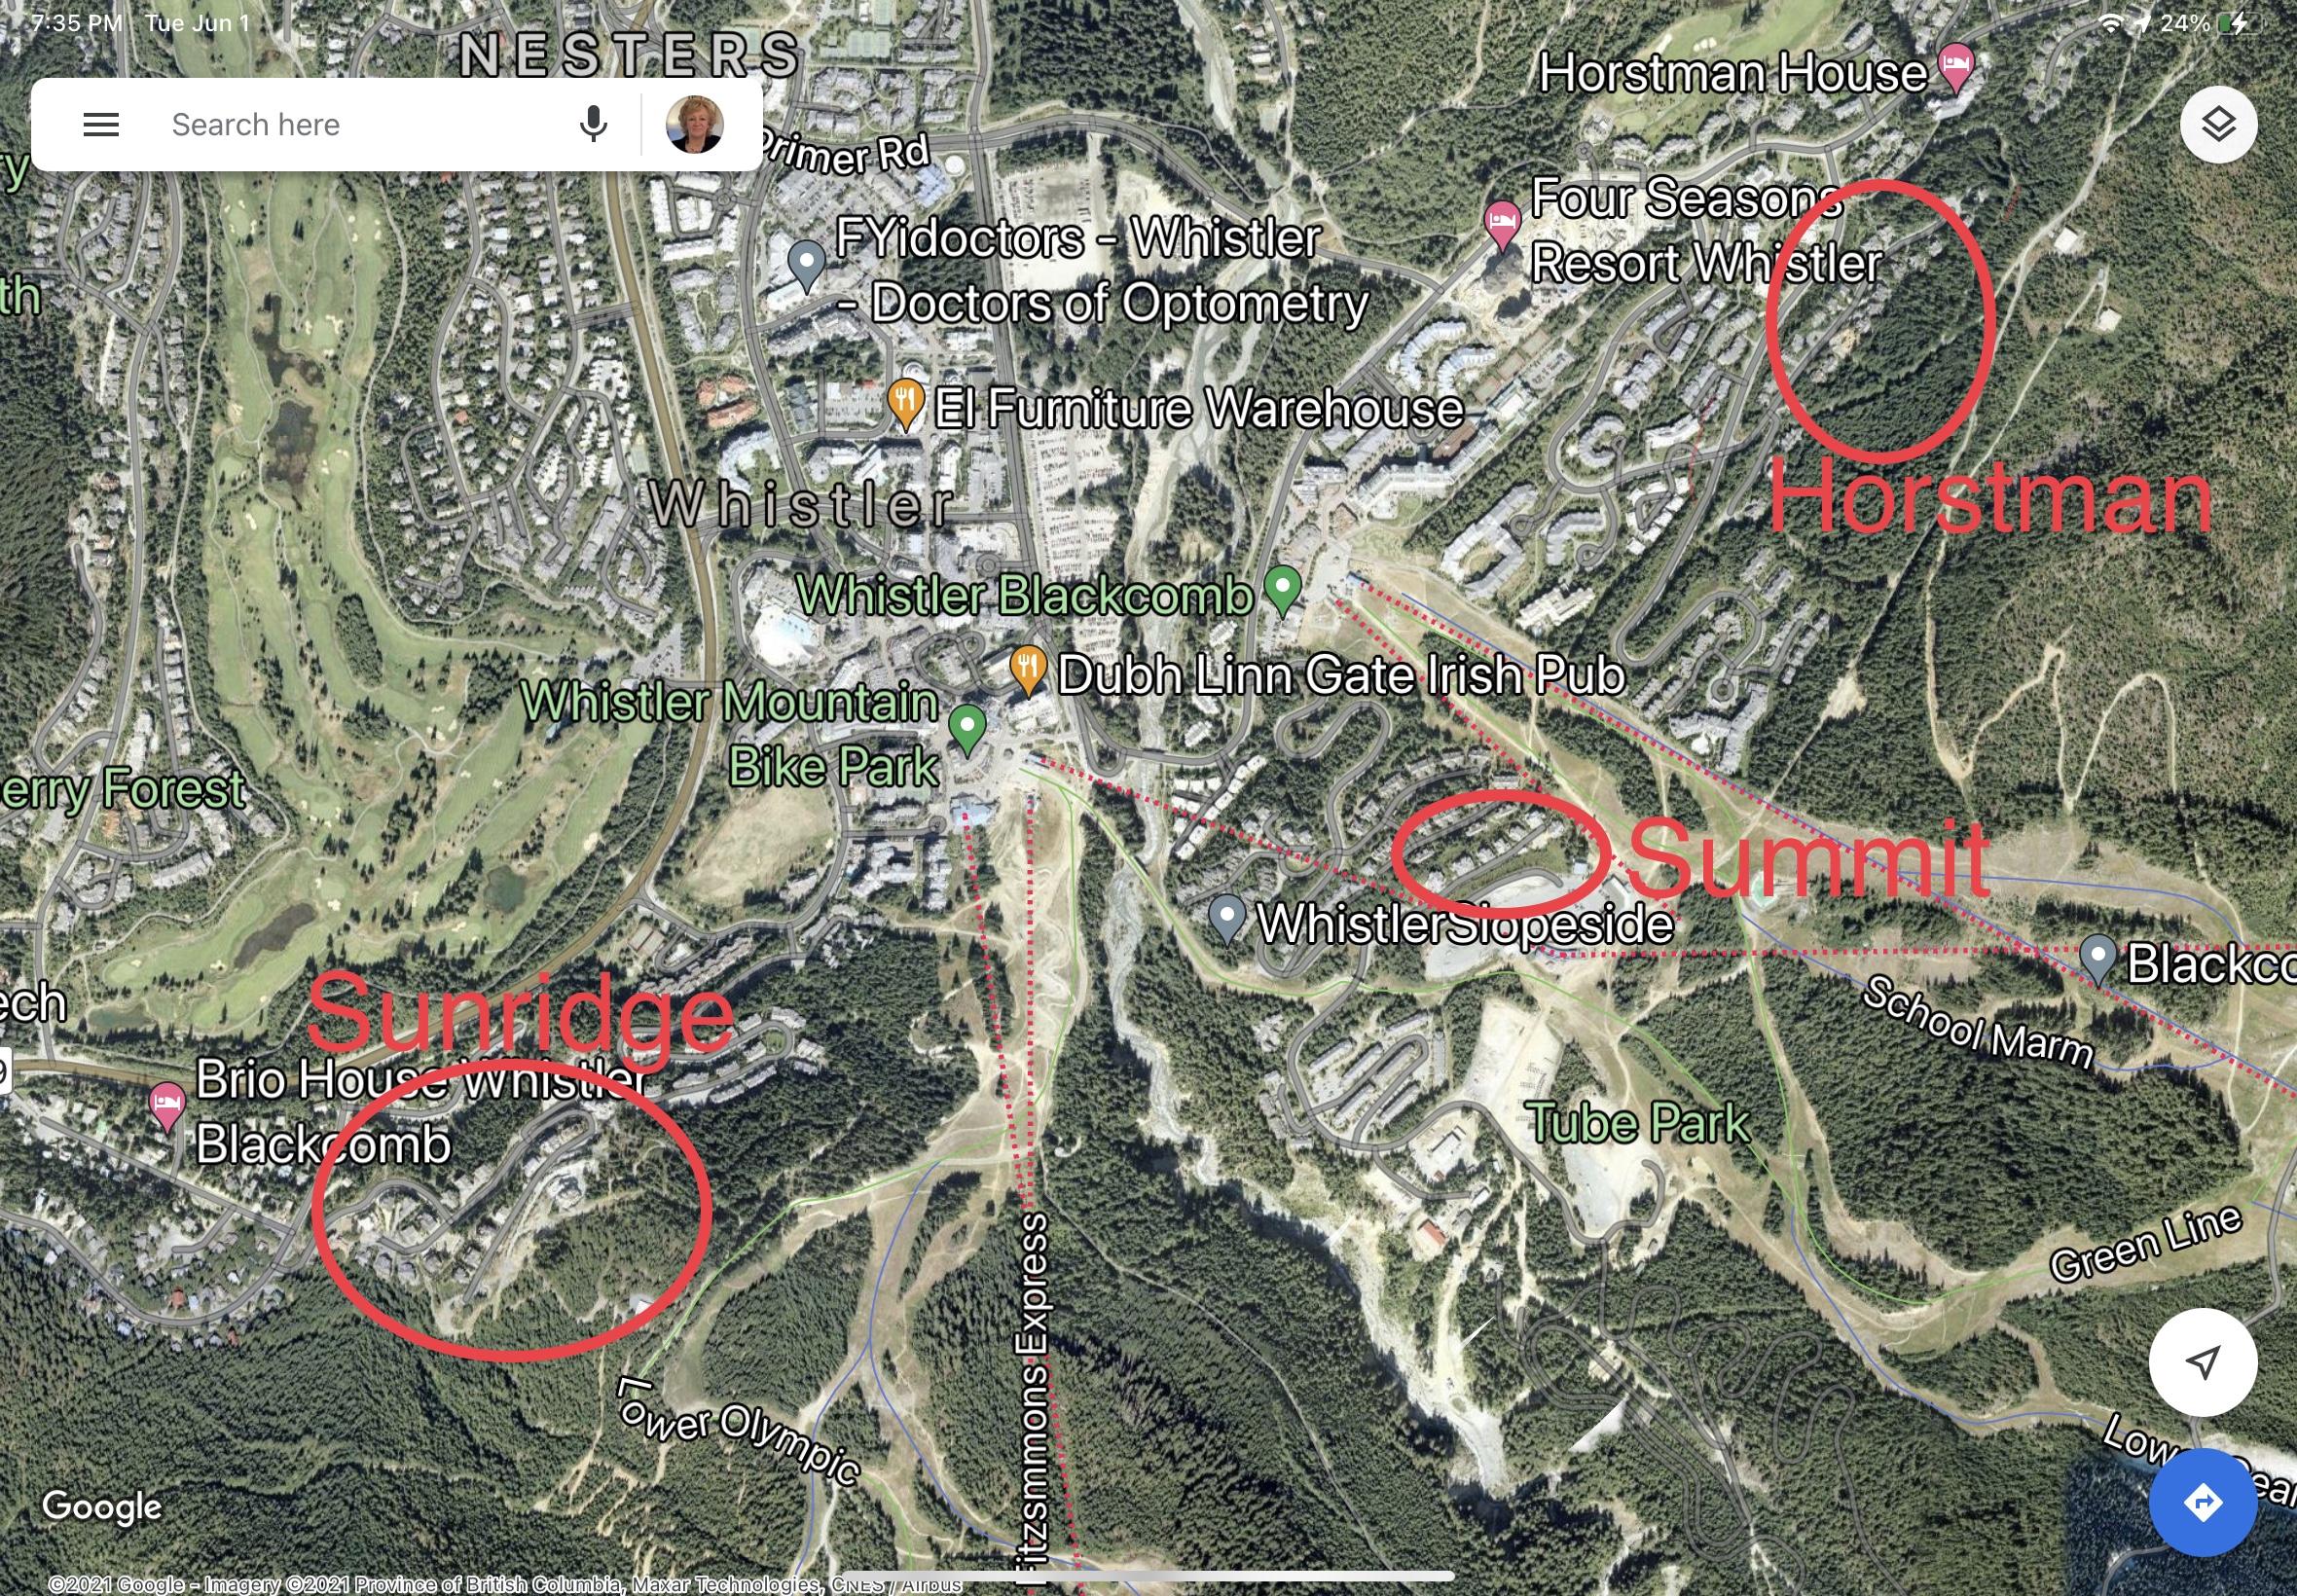 ocation of detached houses on Blackcomb Mountain